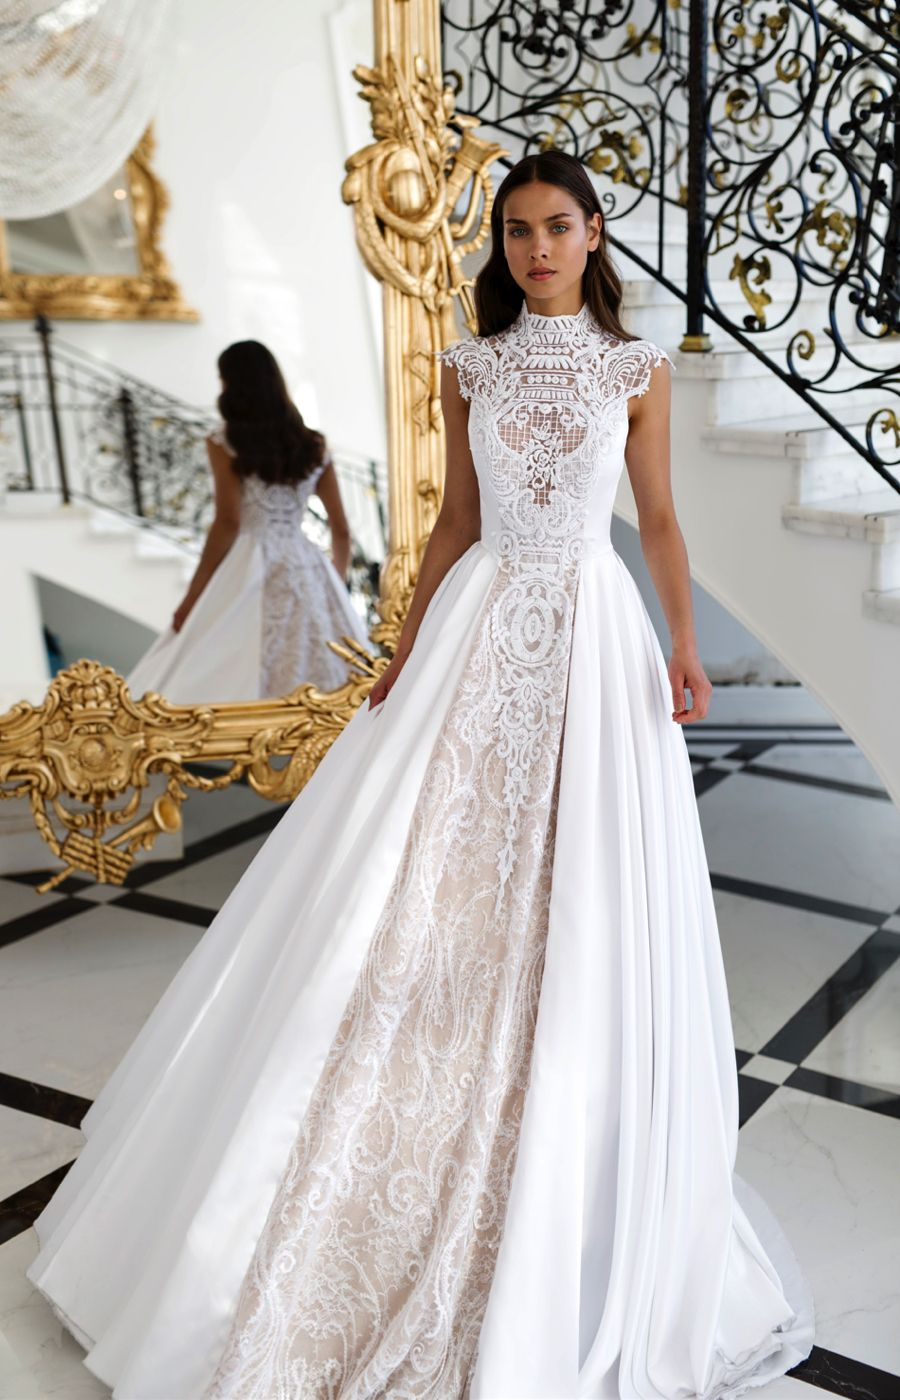 12 Pippa Middleton-inspired wedding dress styles | Hens, Wedding ...